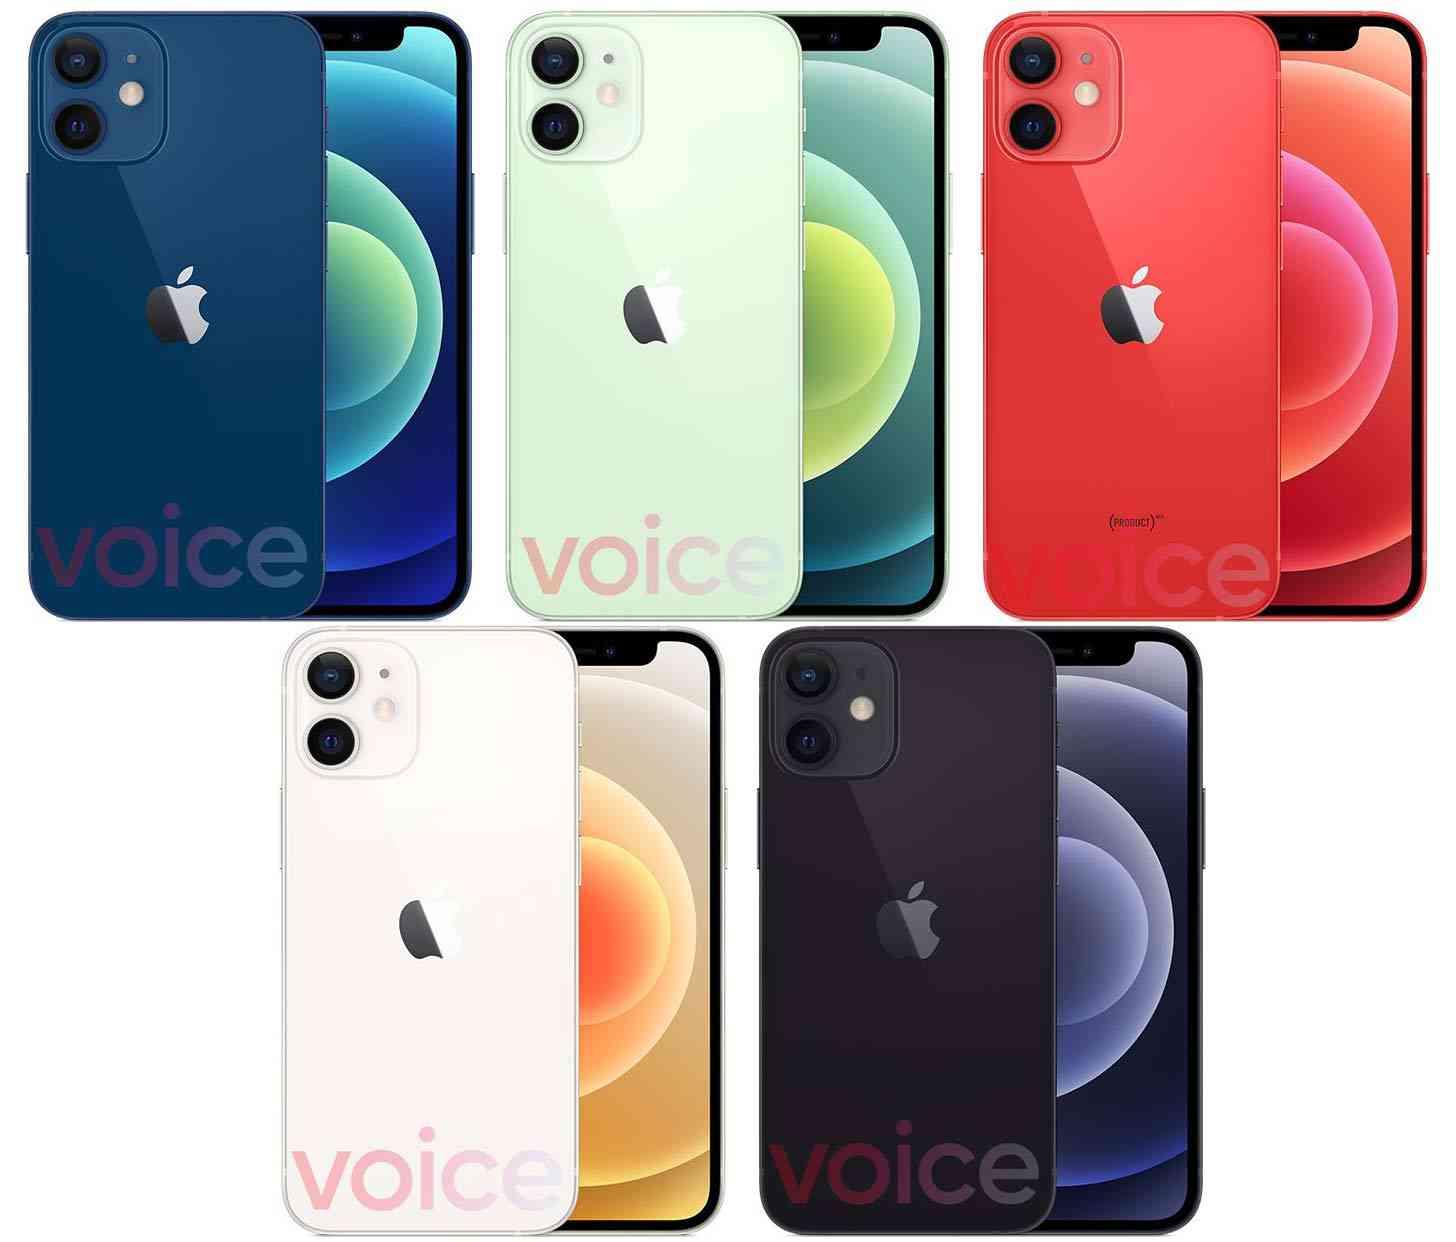 iPhone 12 Mini colors leak